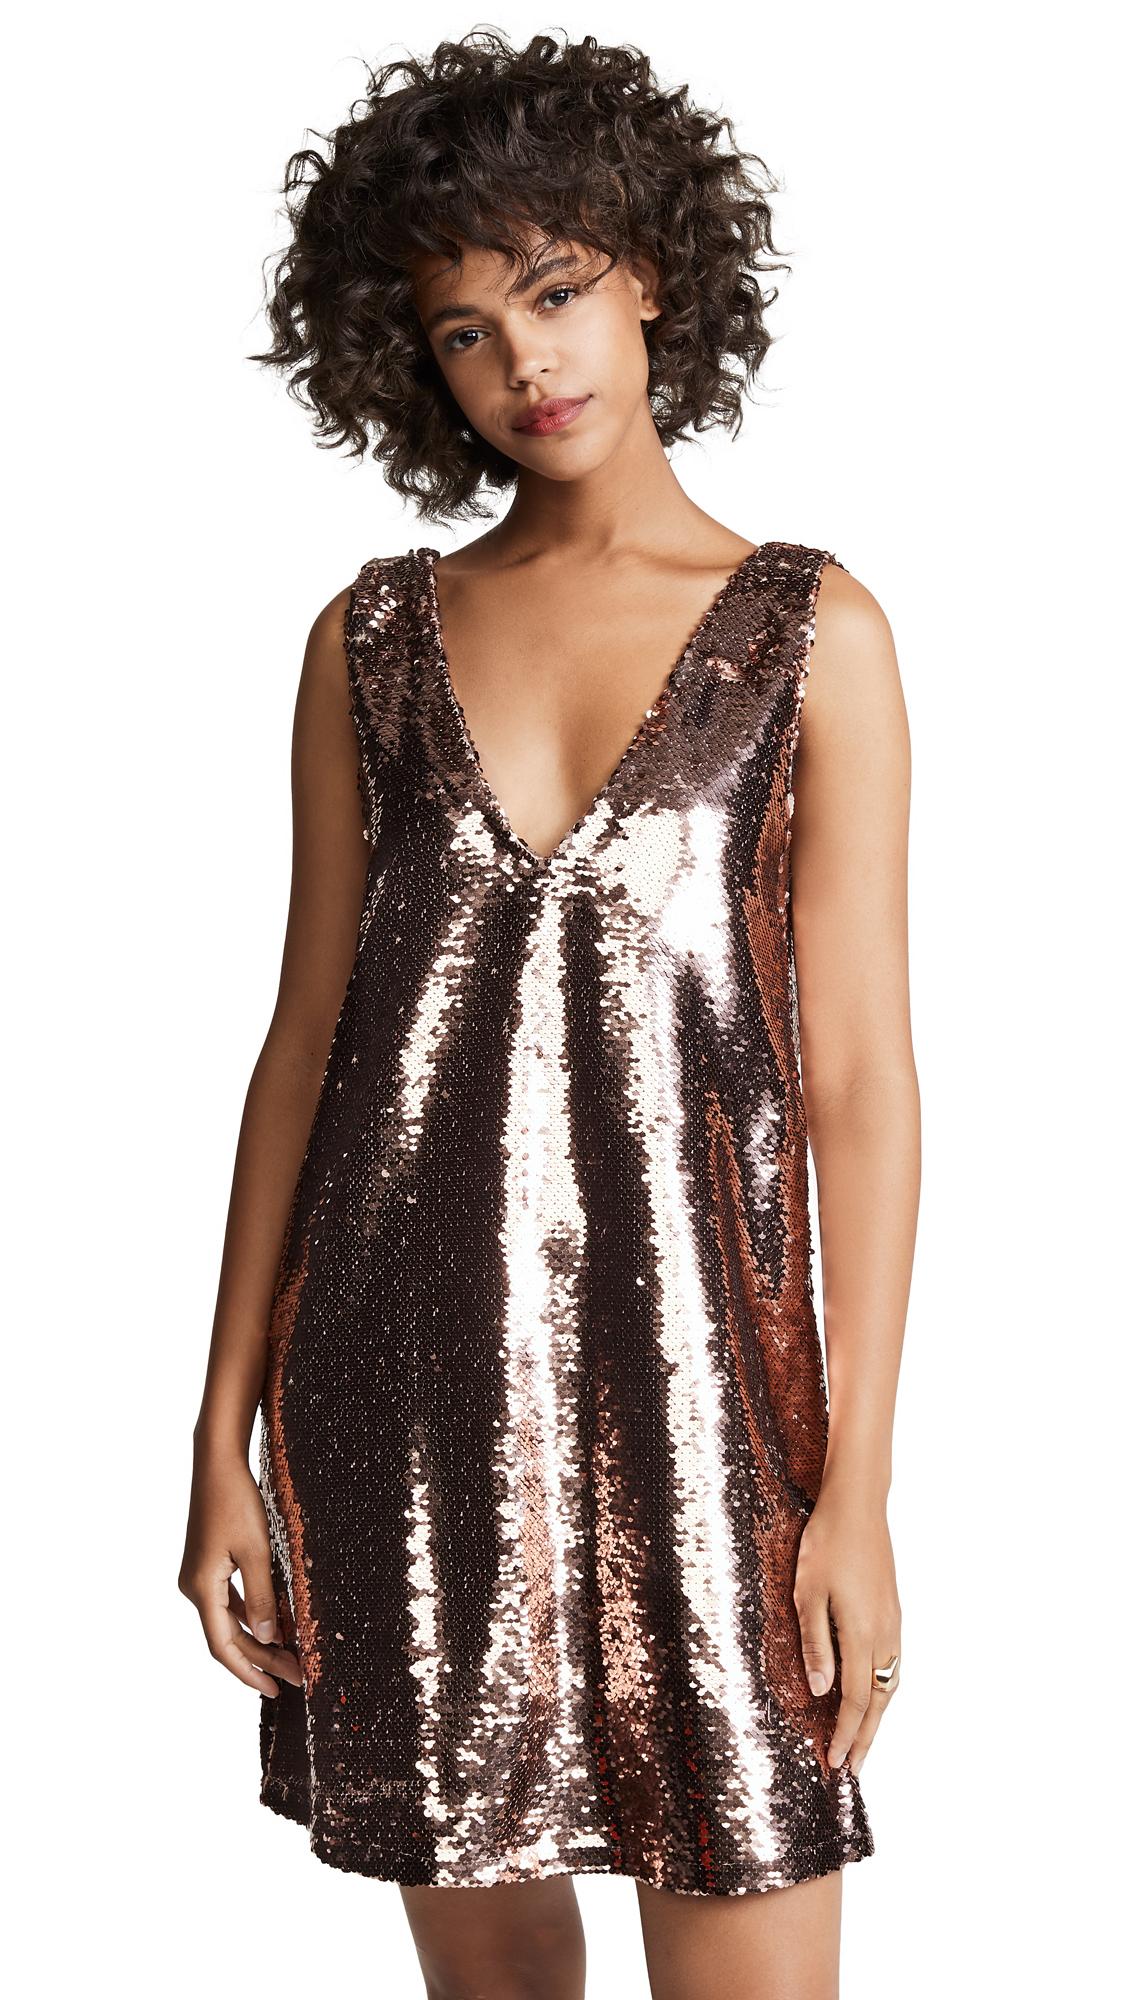 BB Dakota Sparkle Motion Shift Dress - Rose Gold